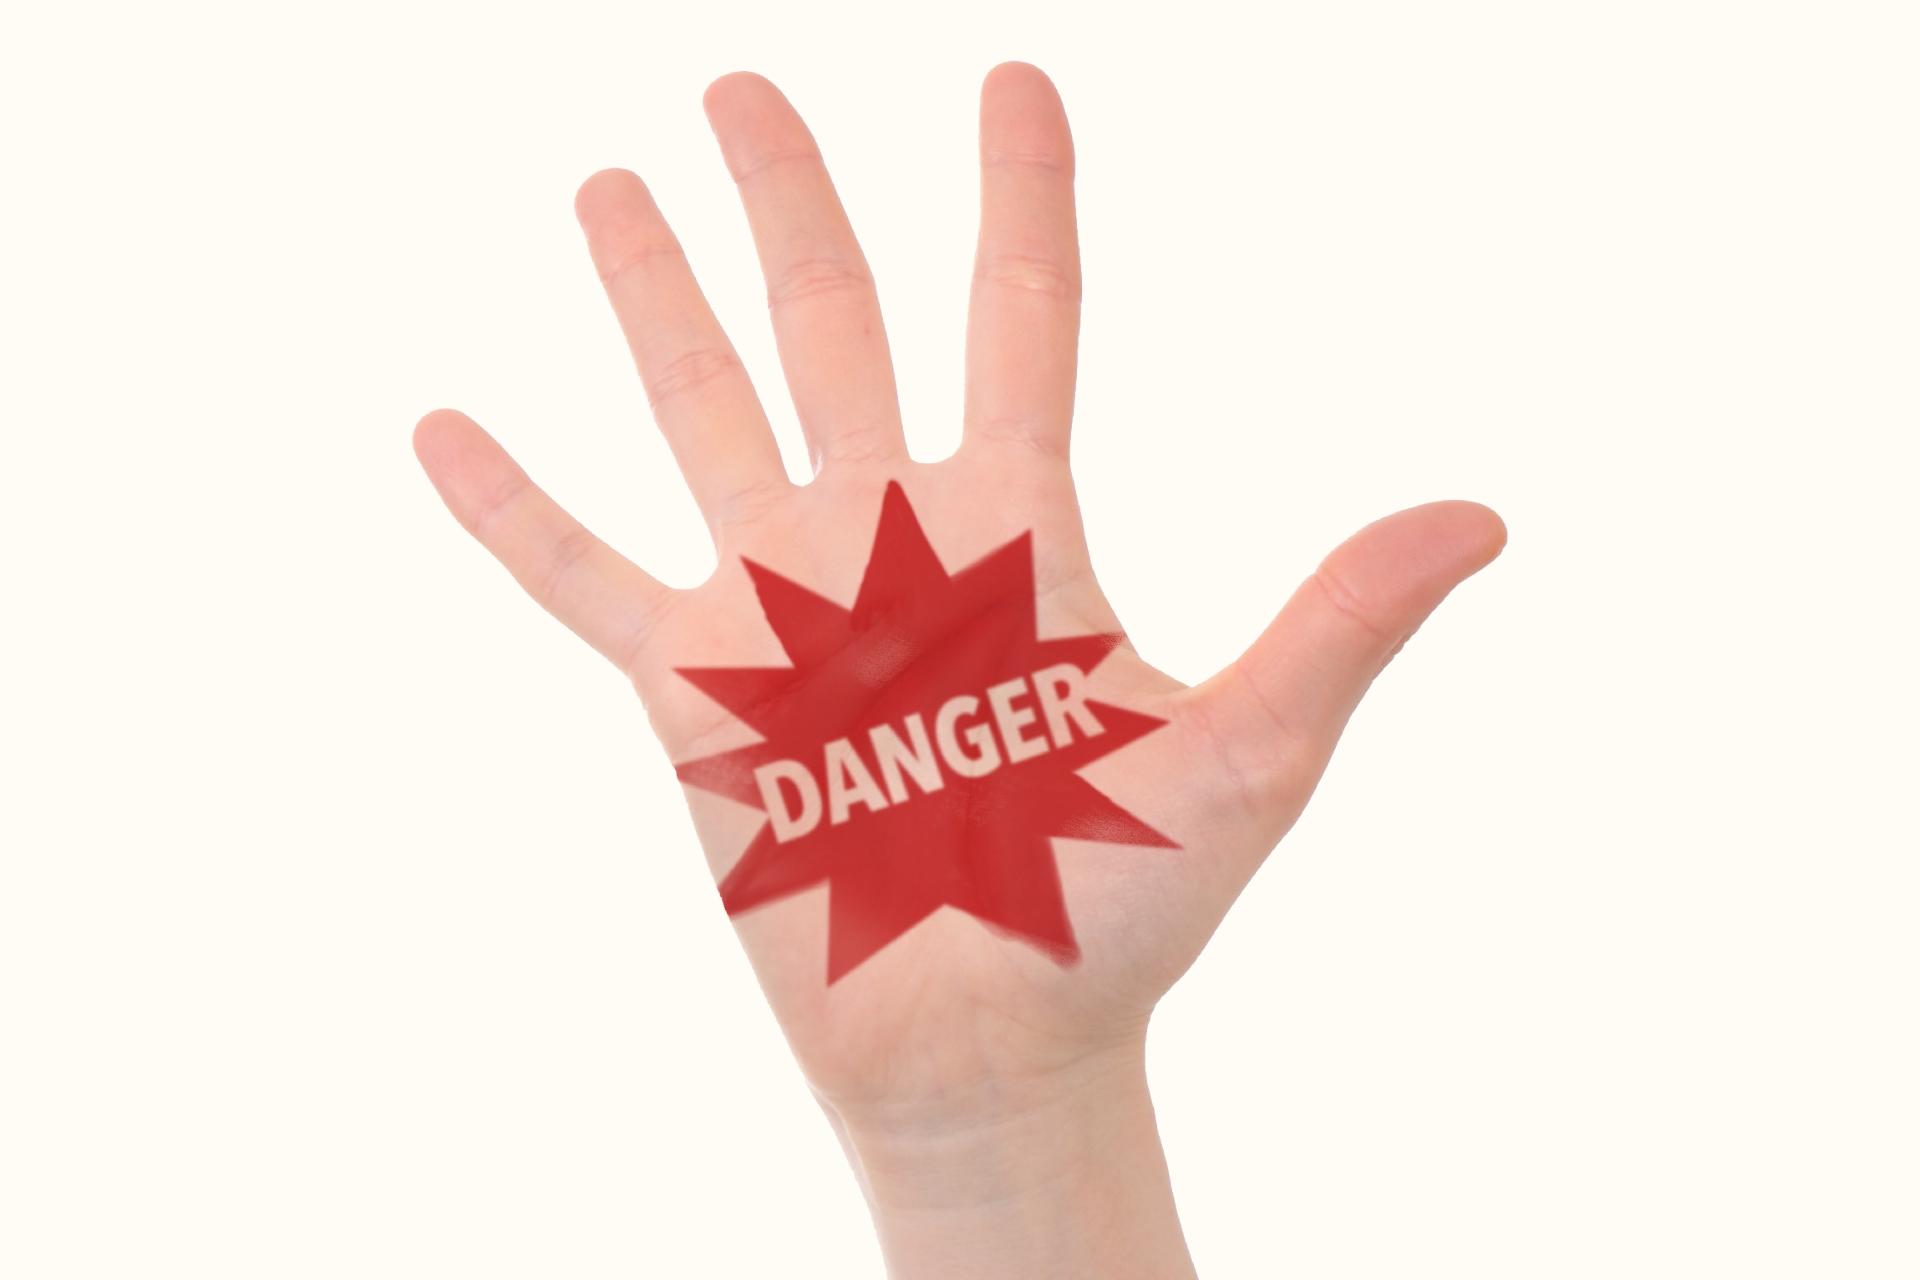 bi 013baby02 危険な日用品から赤ちゃんを守るために知っておきたいこと2